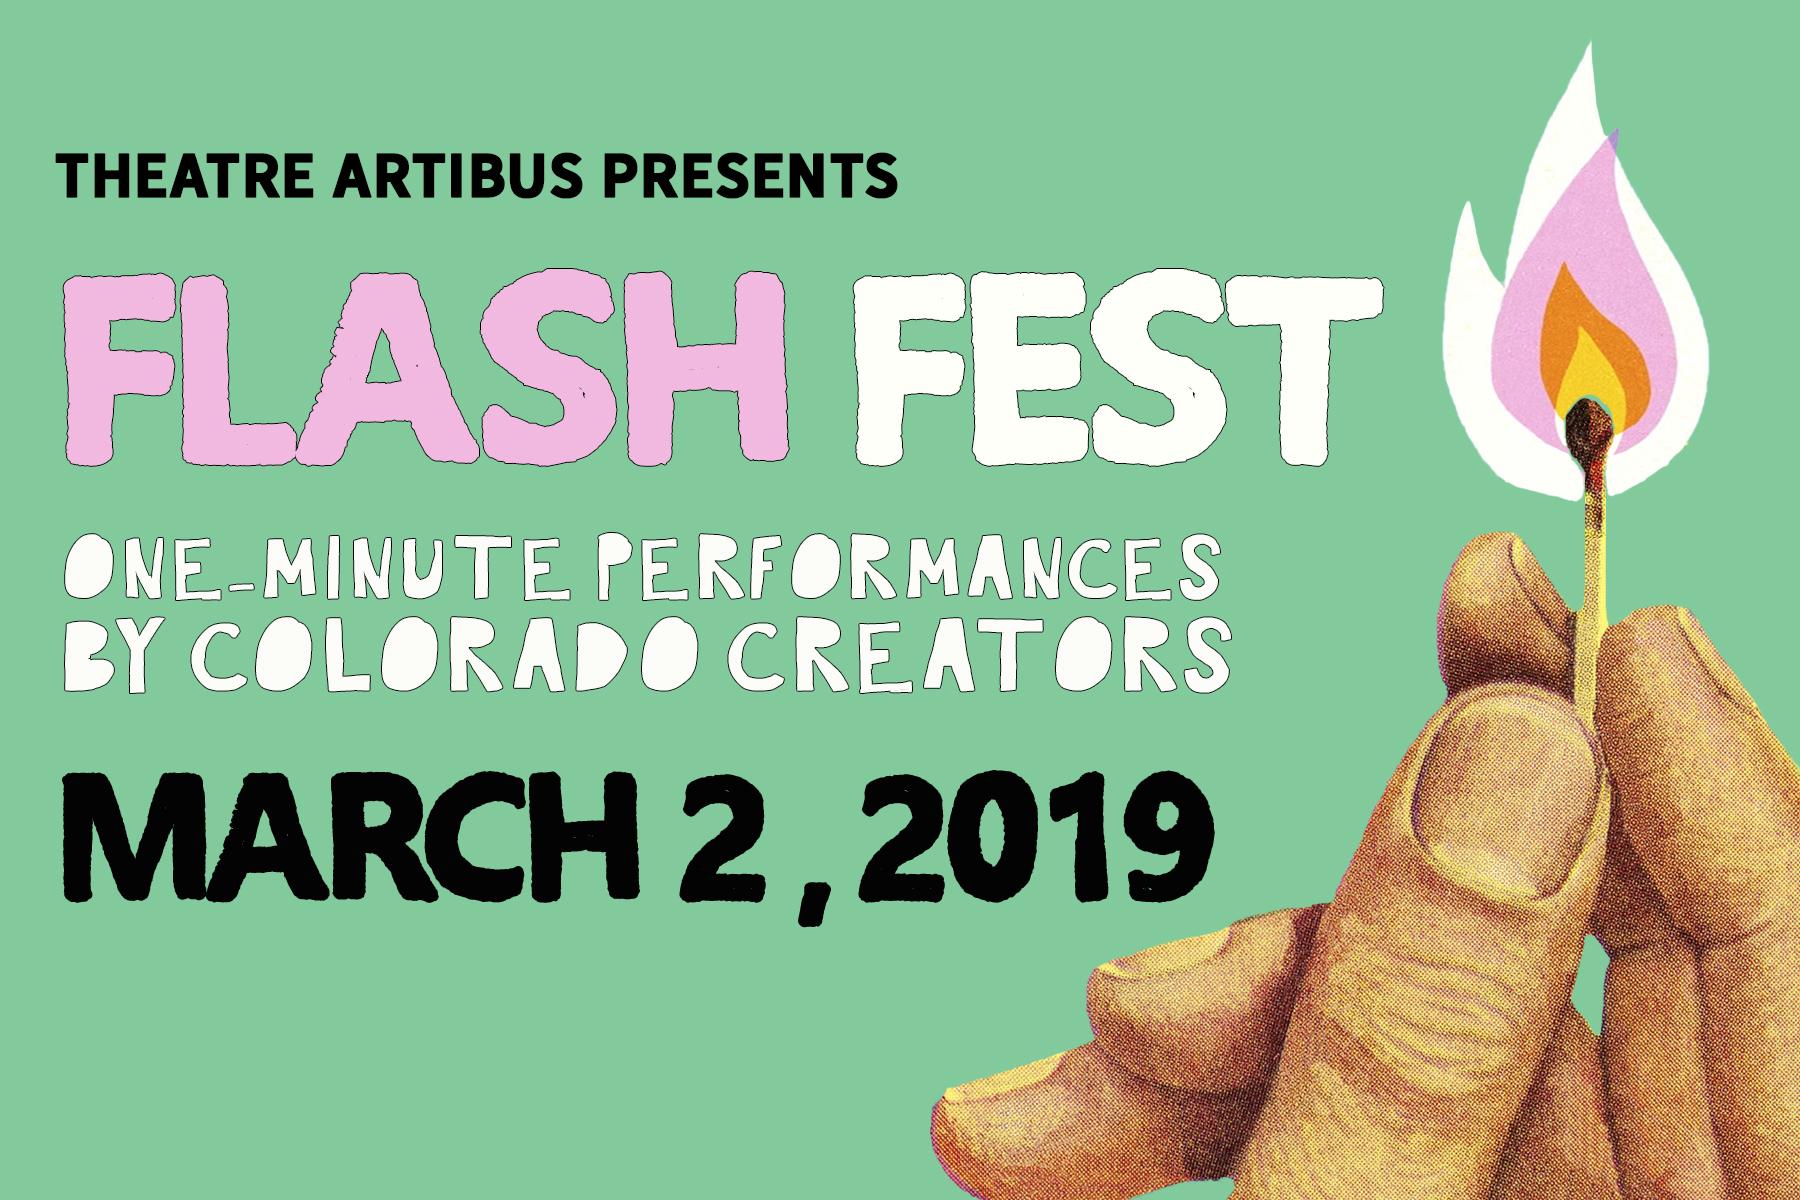 Theatre Artibus presents FLASH FEST: AN EVENING OF ONE-MINUTE PERFORMANCES